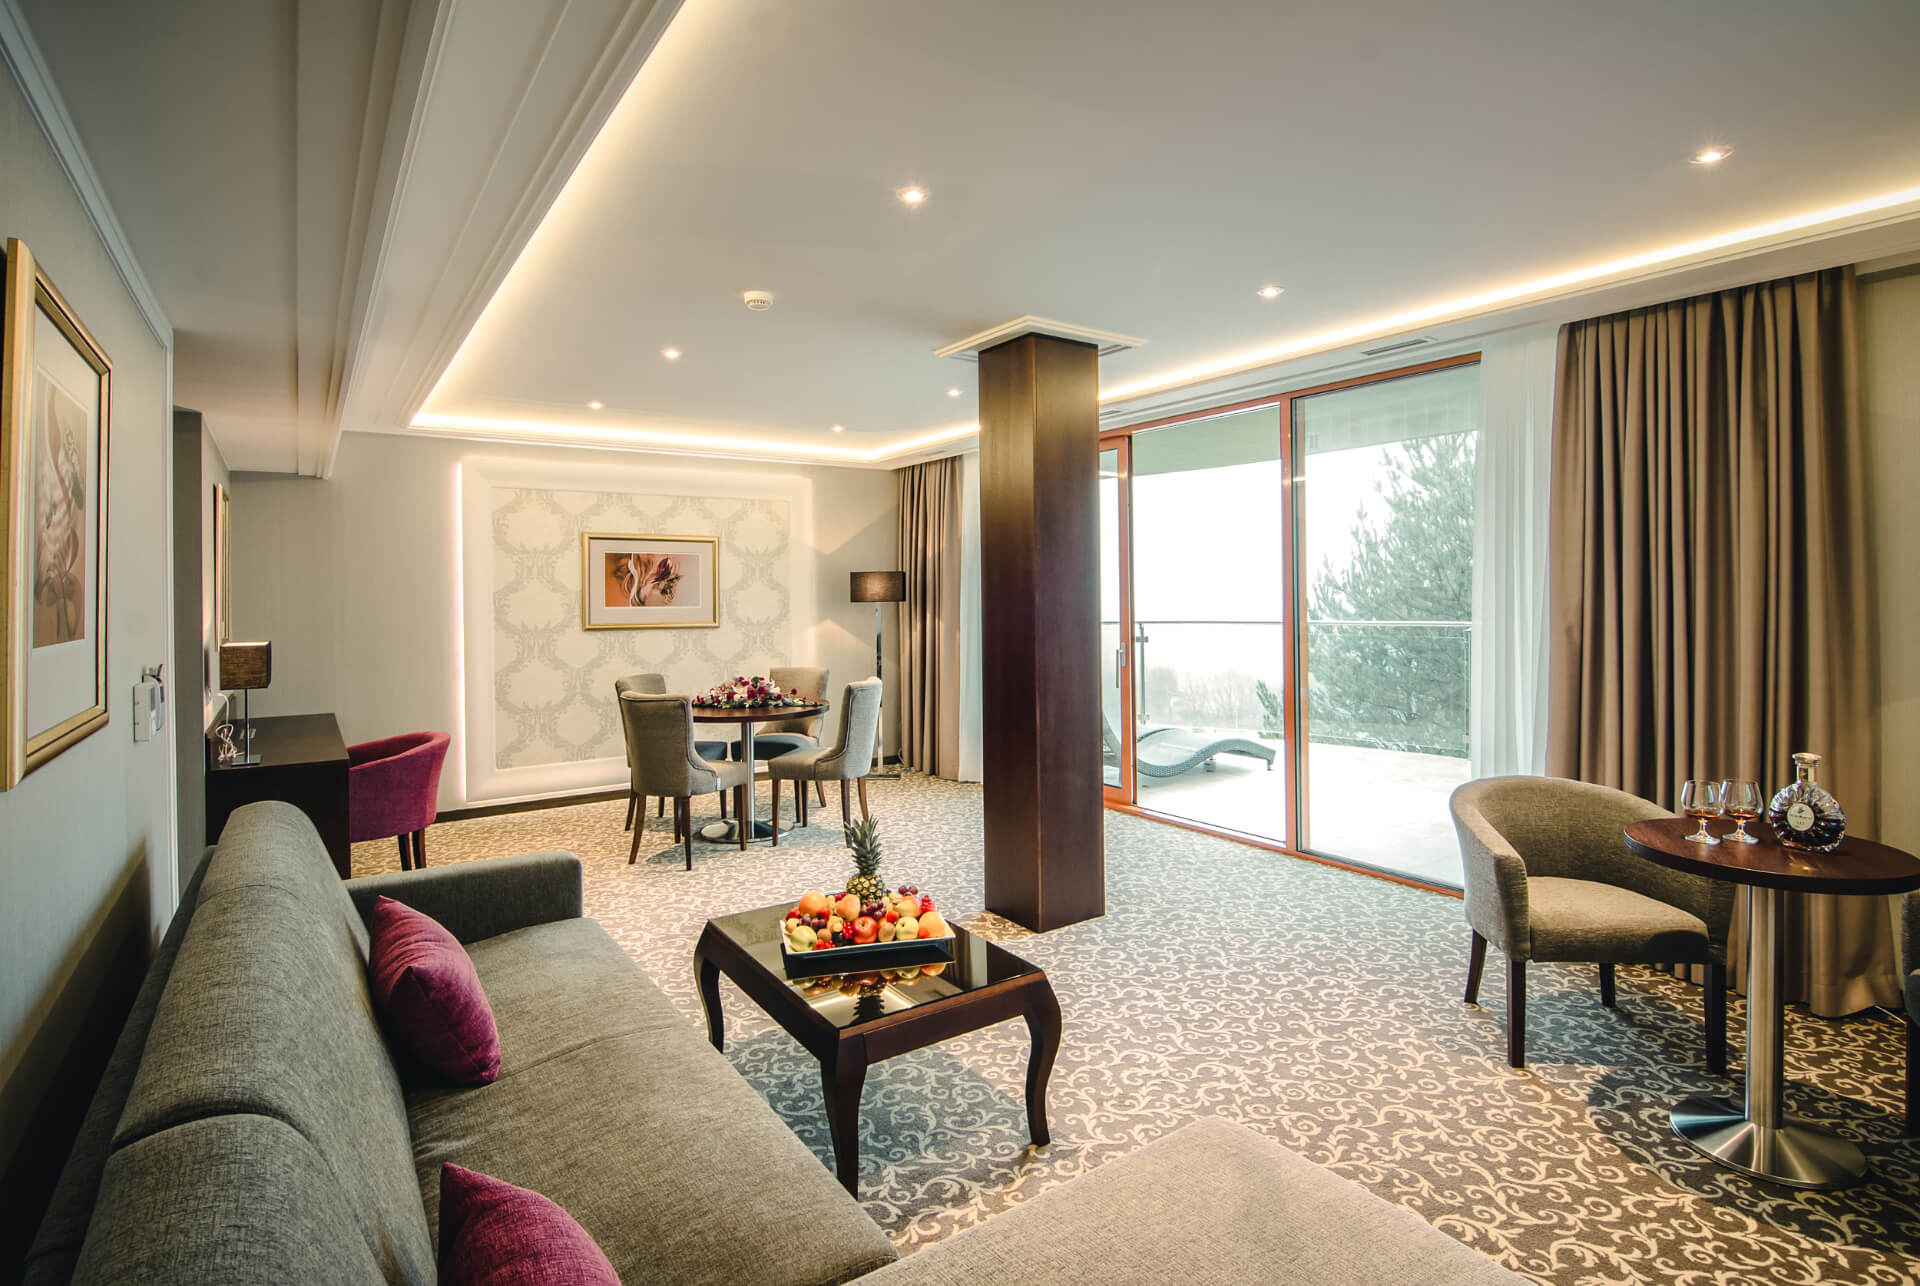 3-rooms suite in Prestige design